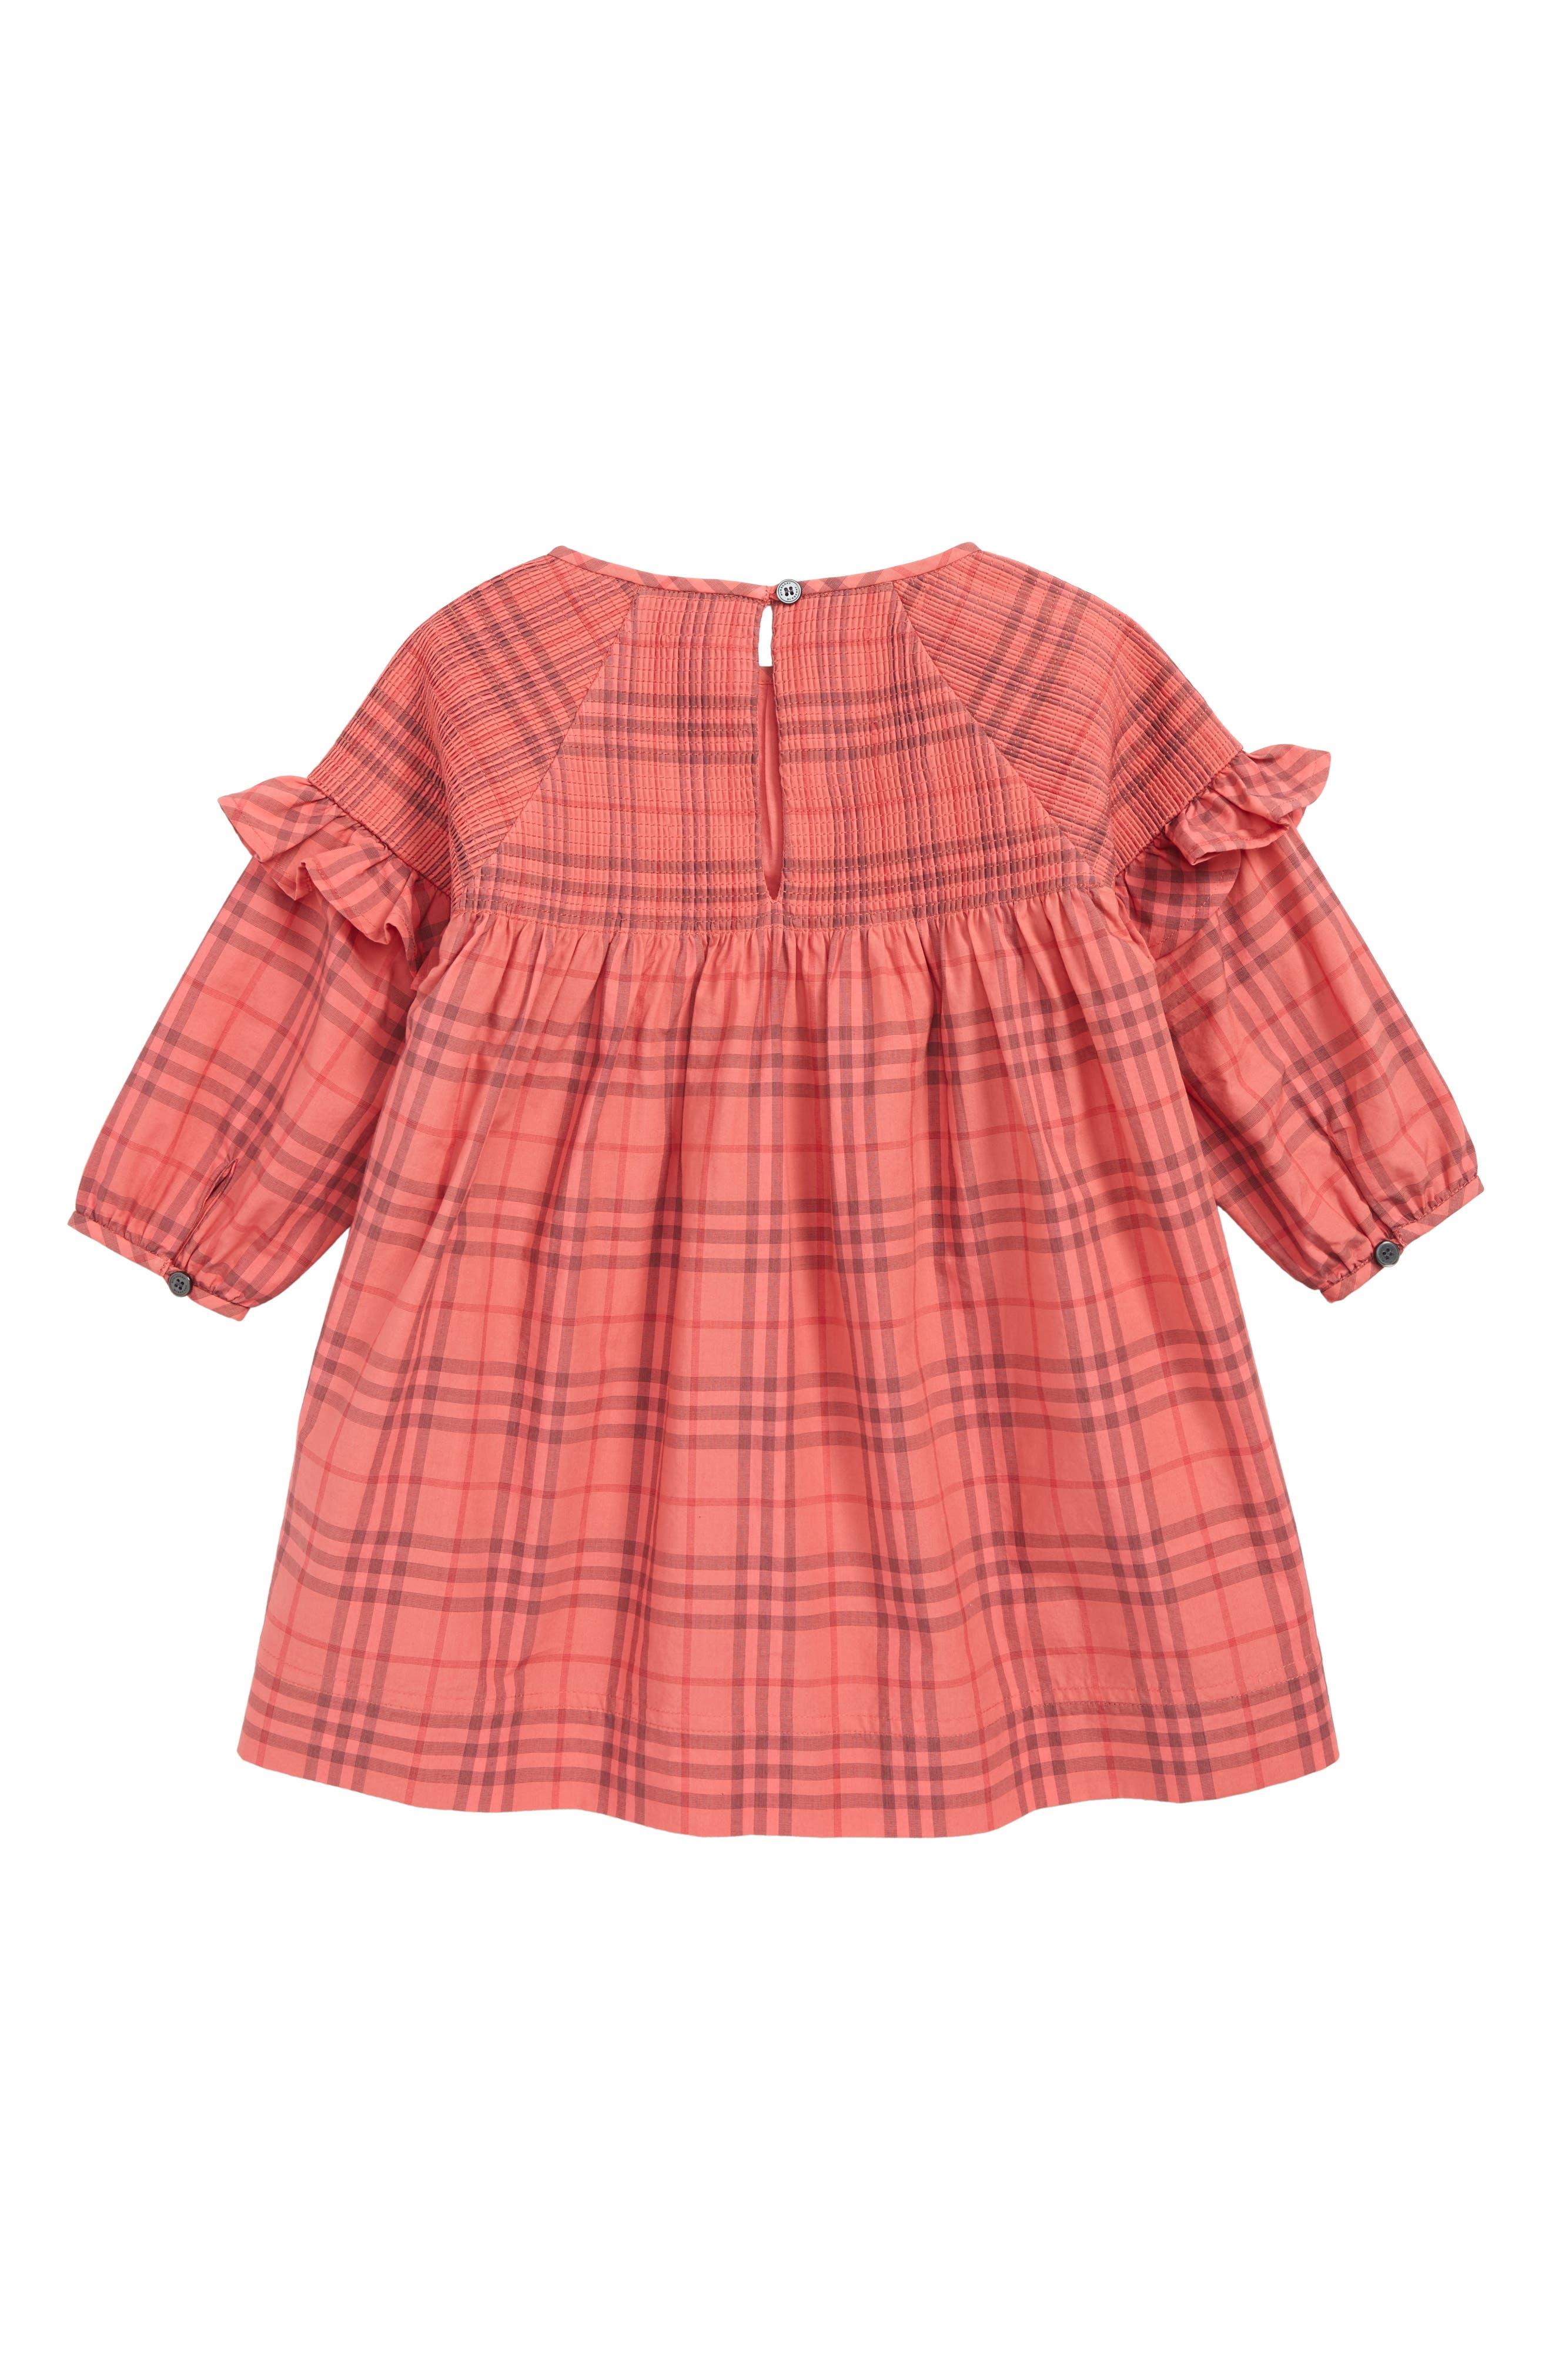 Mini Loralie Ruffle Detail Check Cotton Dress,                             Alternate thumbnail 2, color,                             CORAL RED